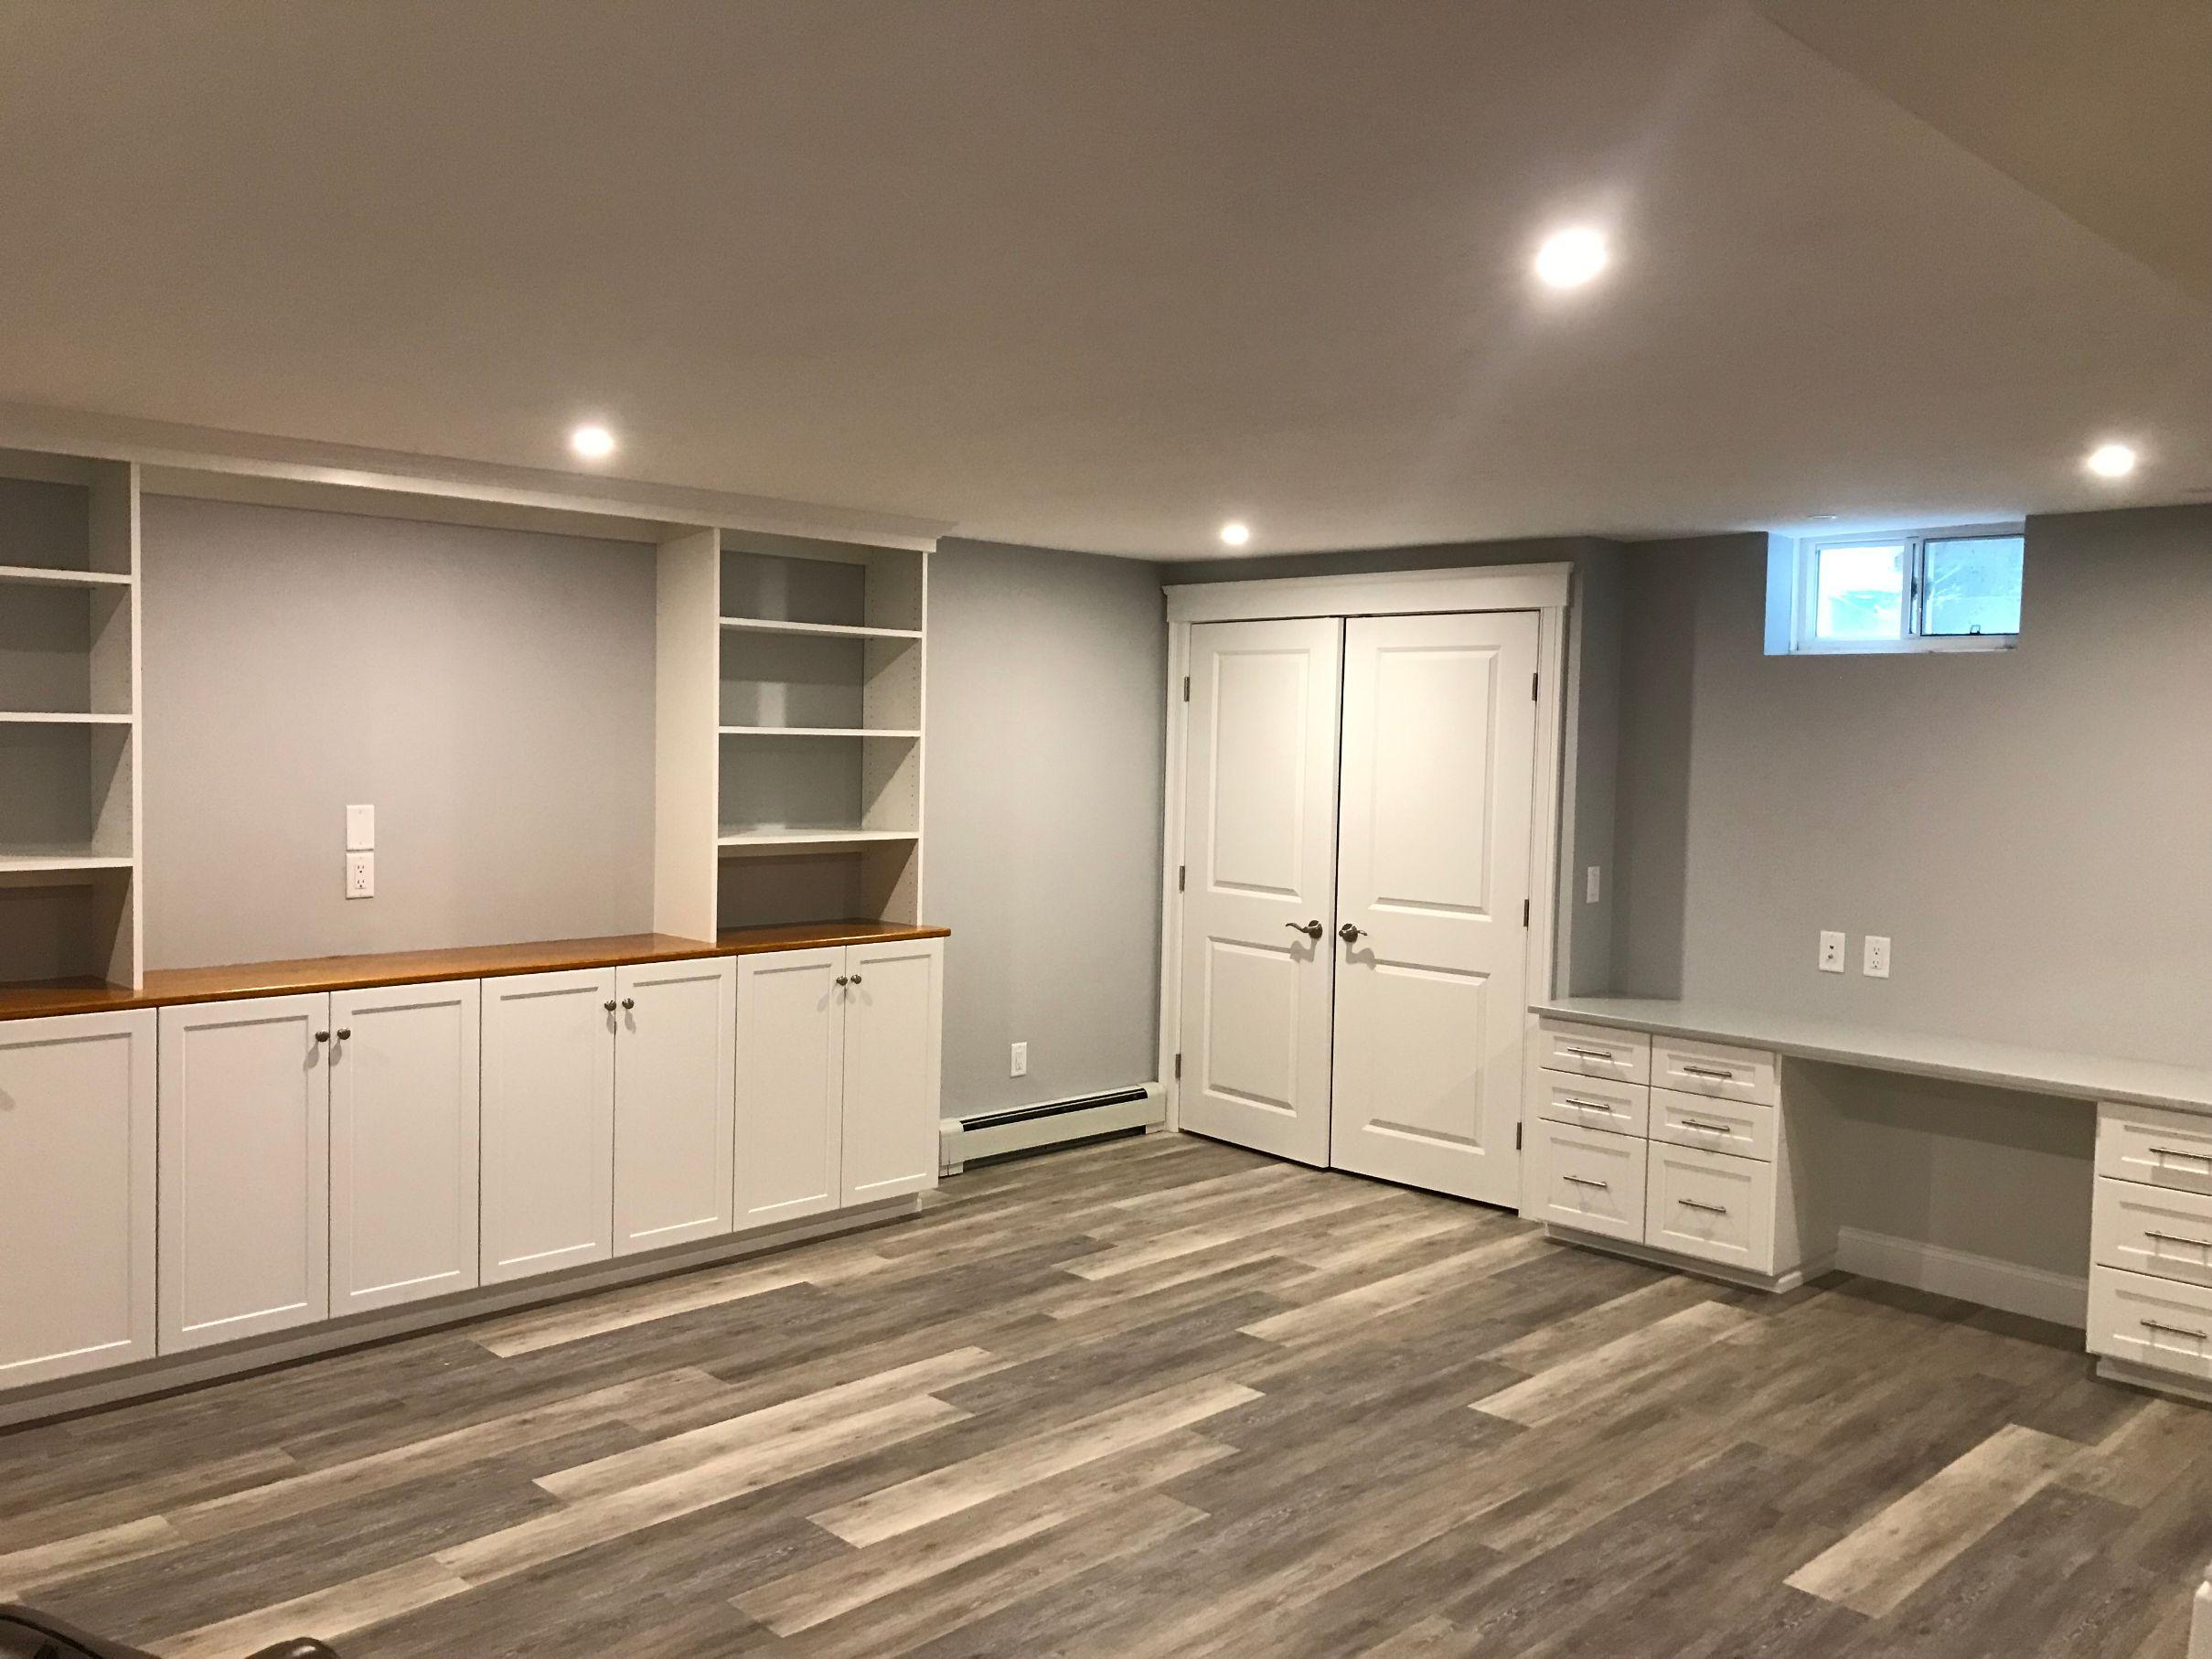 New Entertainment Center - Boston Closet